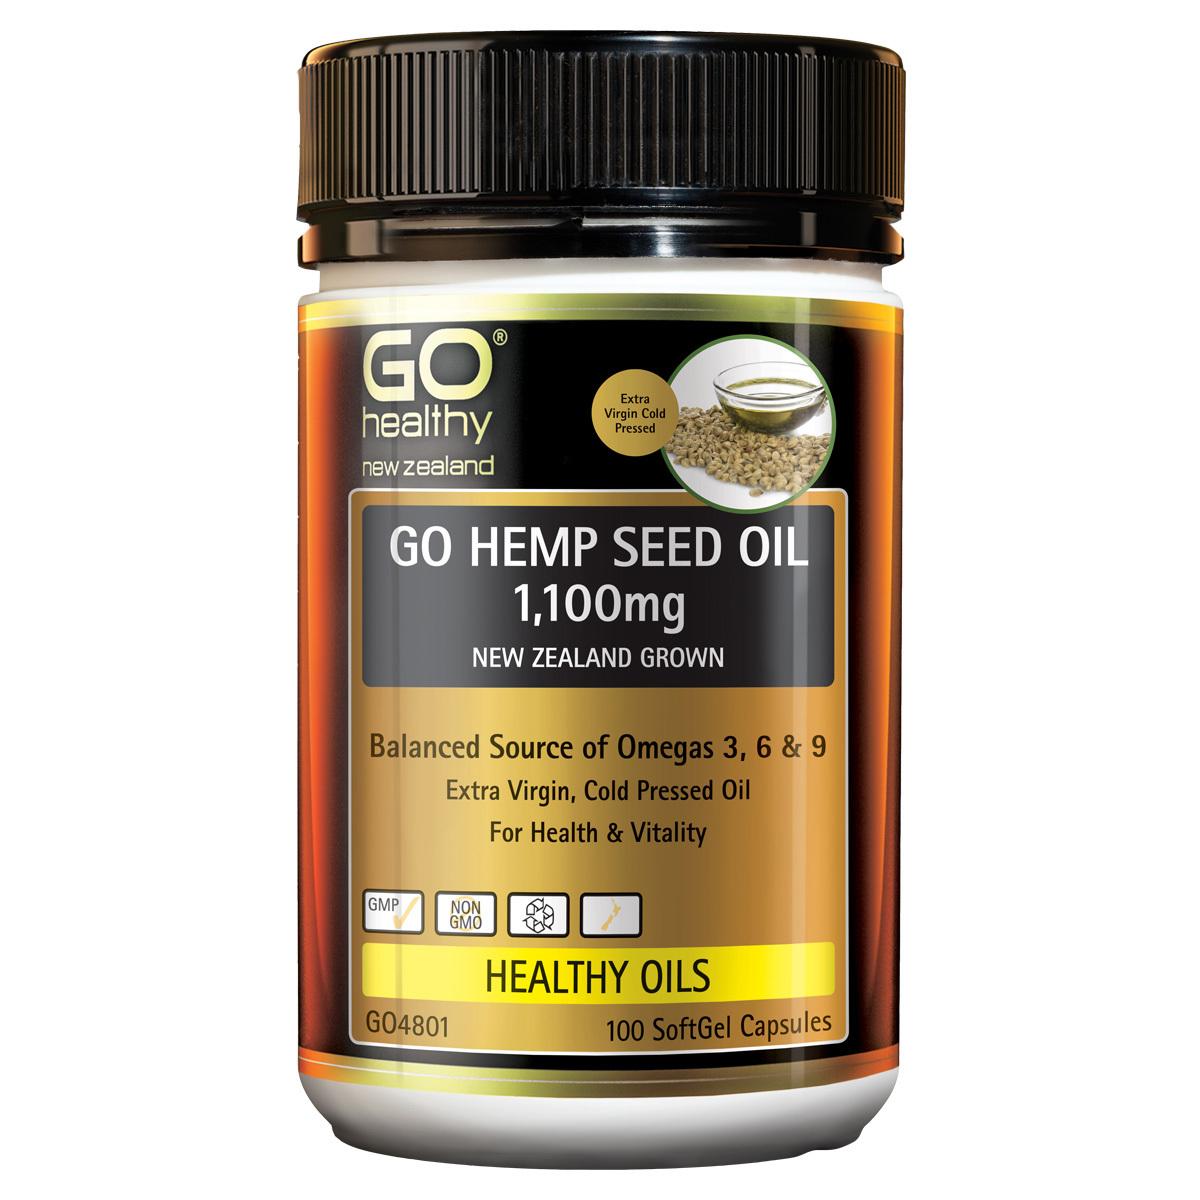 GO Healthy: GO Hemp Seed Oil 1100mg Capsules (100's) image